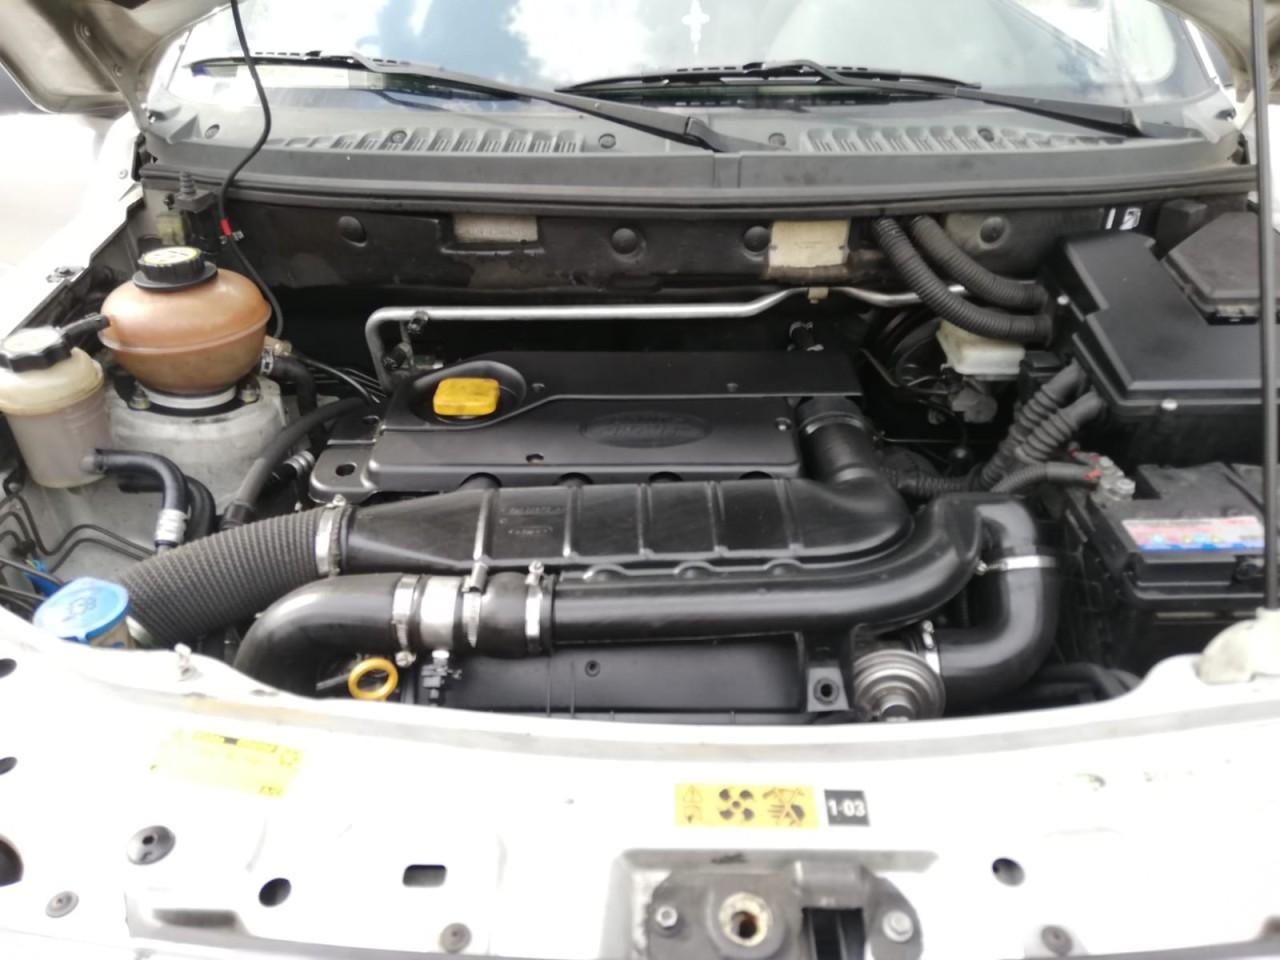 Land-Rover Freelander 2.0d 2004